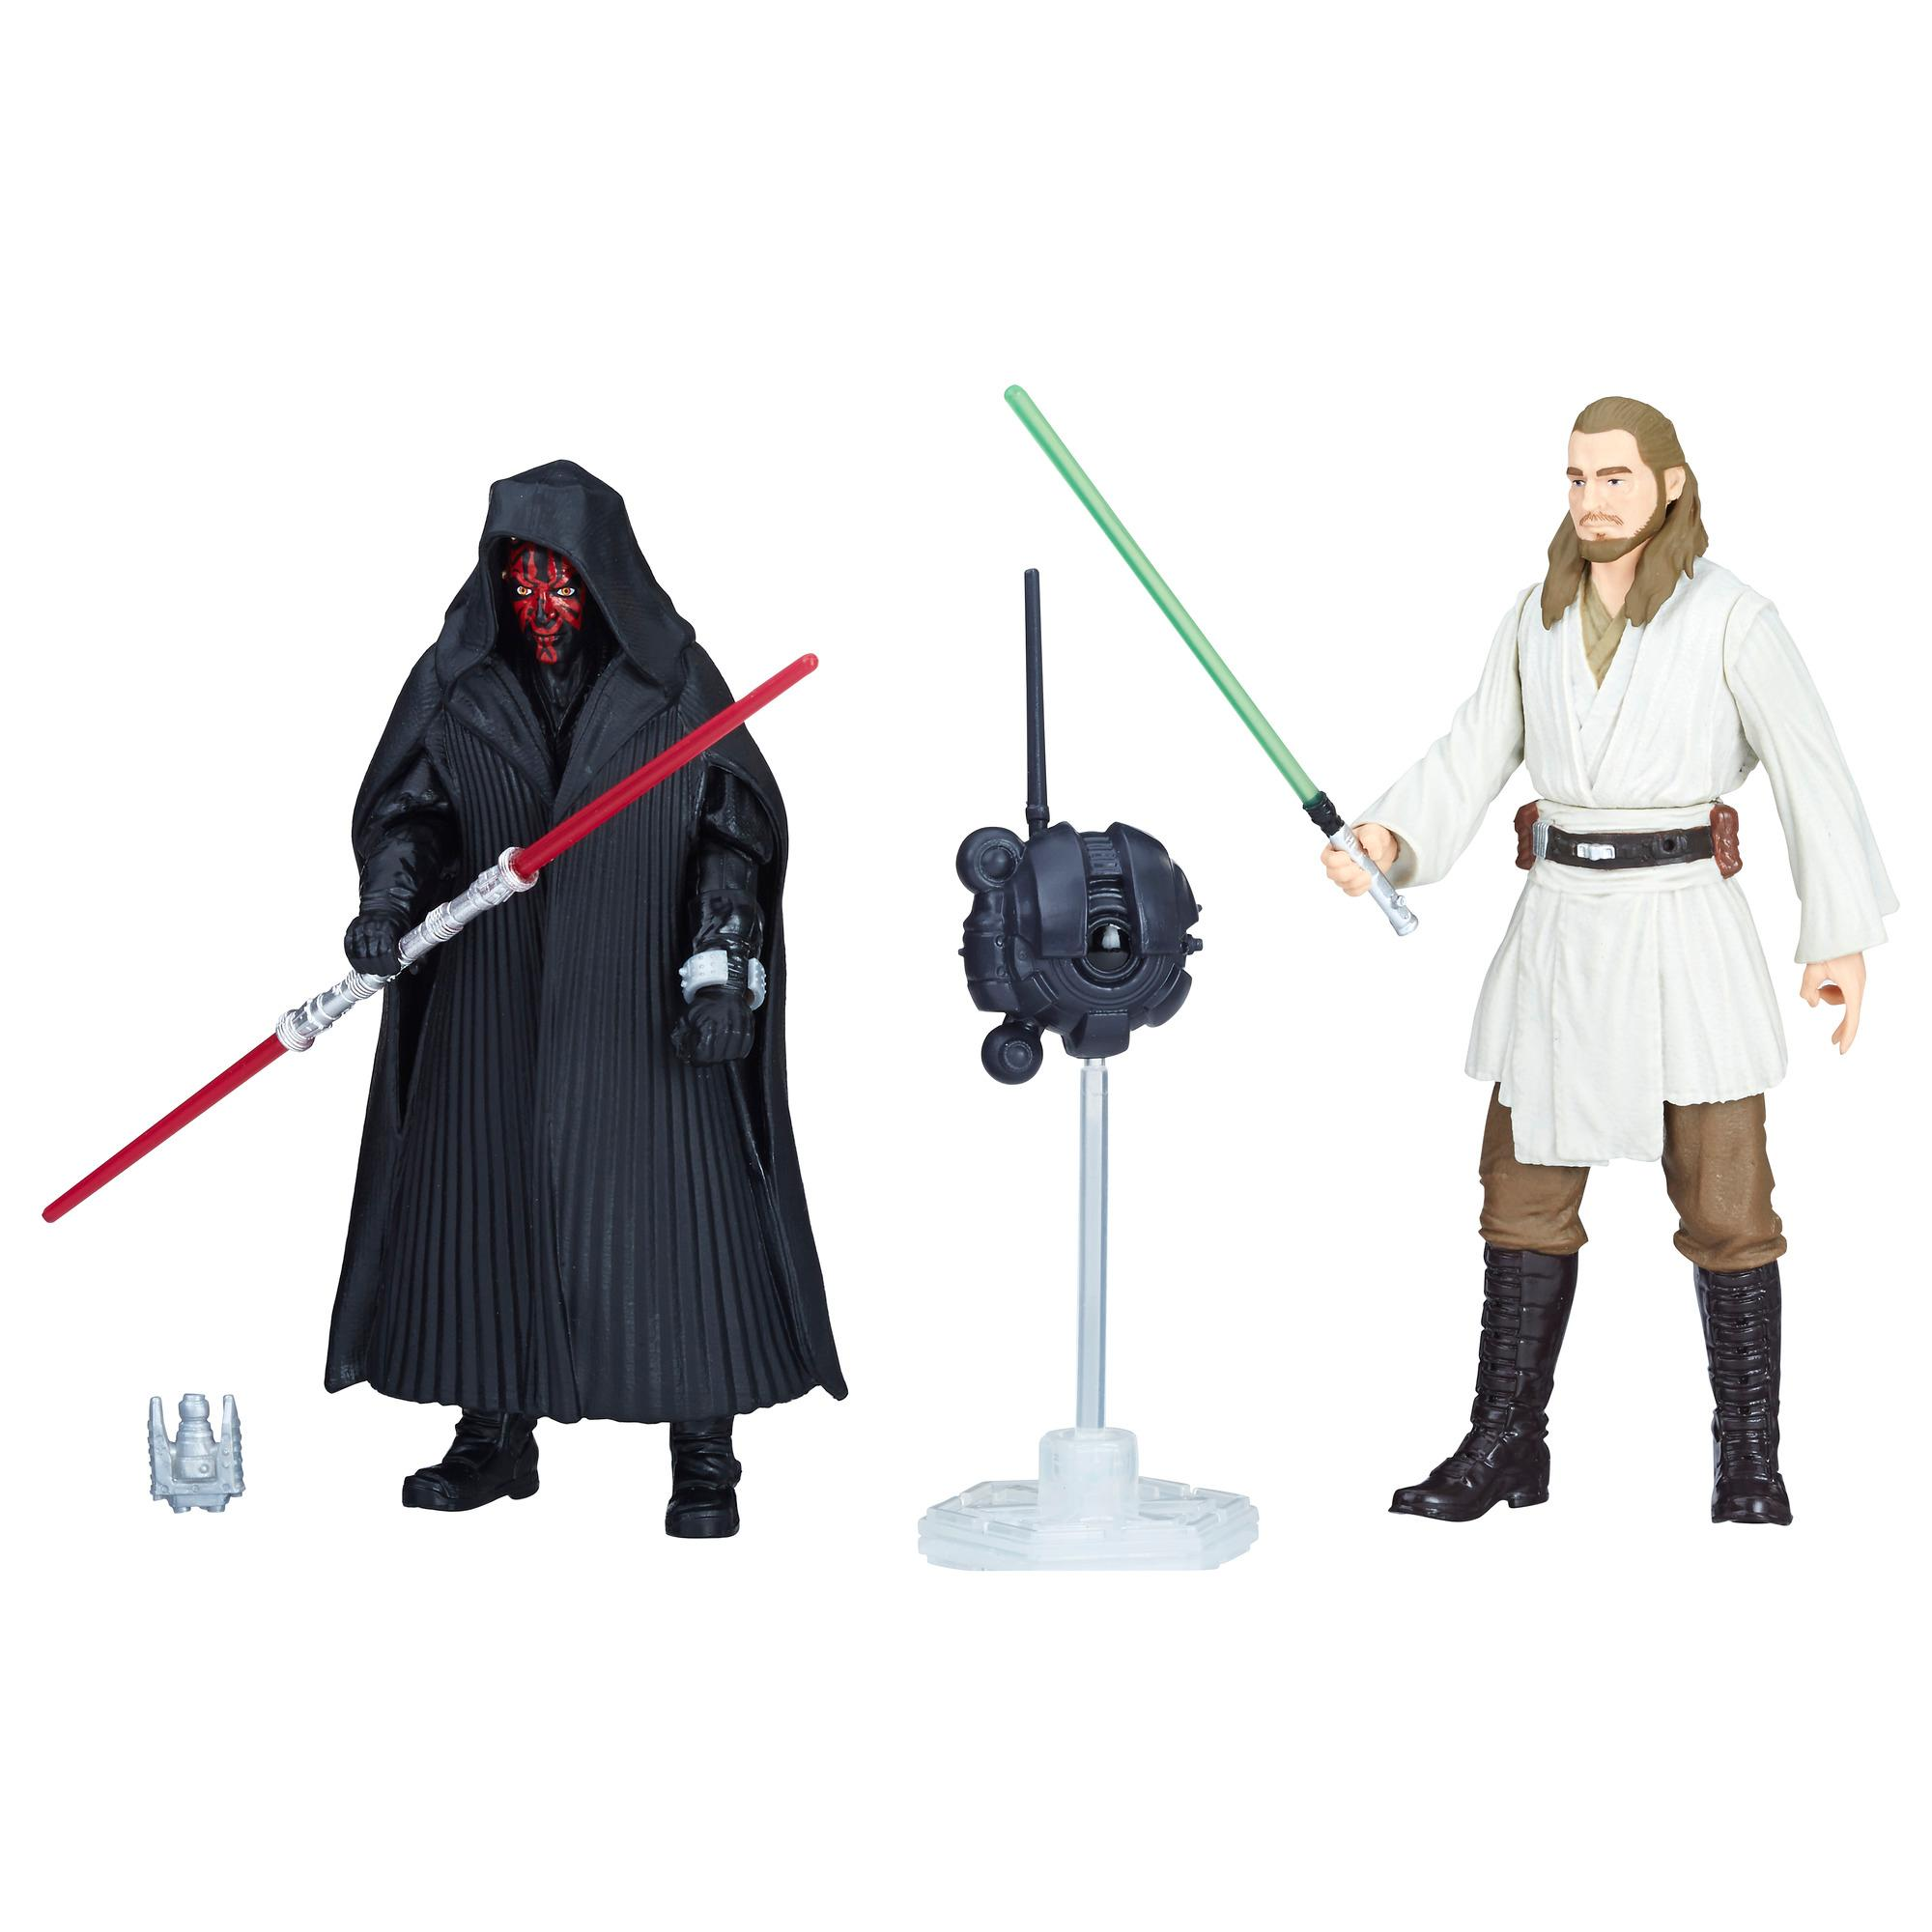 Star Wars Force Link 2.0 - Figuras de Darth Vader y Qui-Gon Jinn